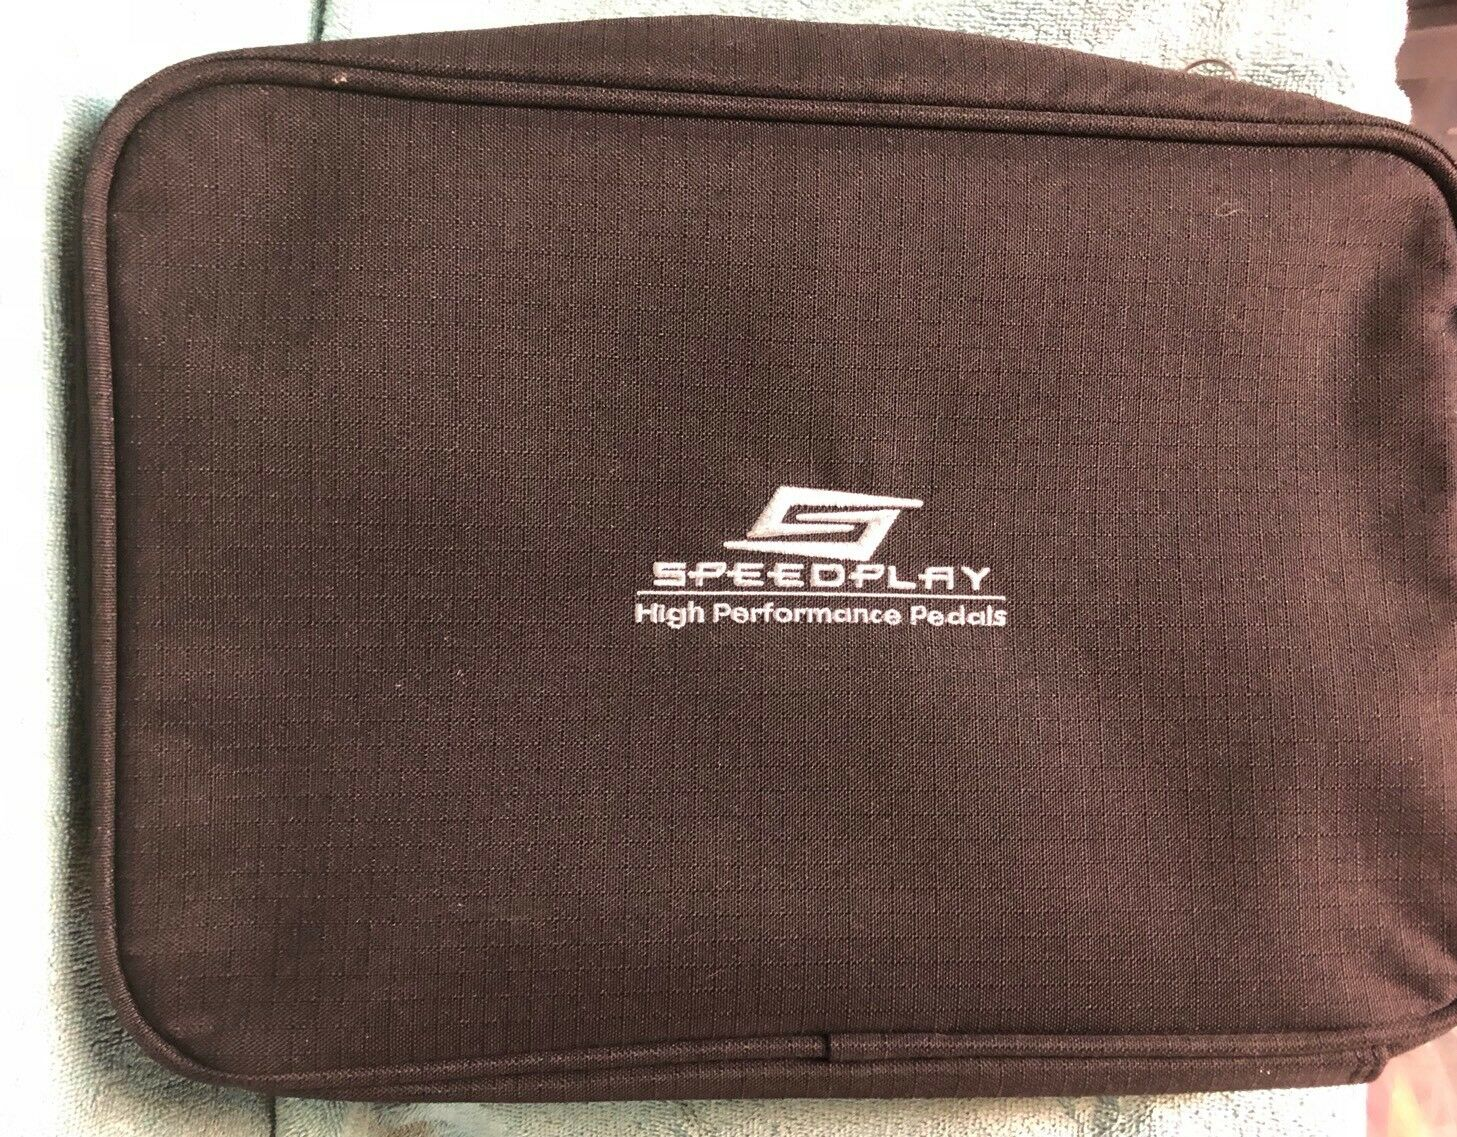 Portfolio SPEED PLAY Speedplay Document Case Laptop Case